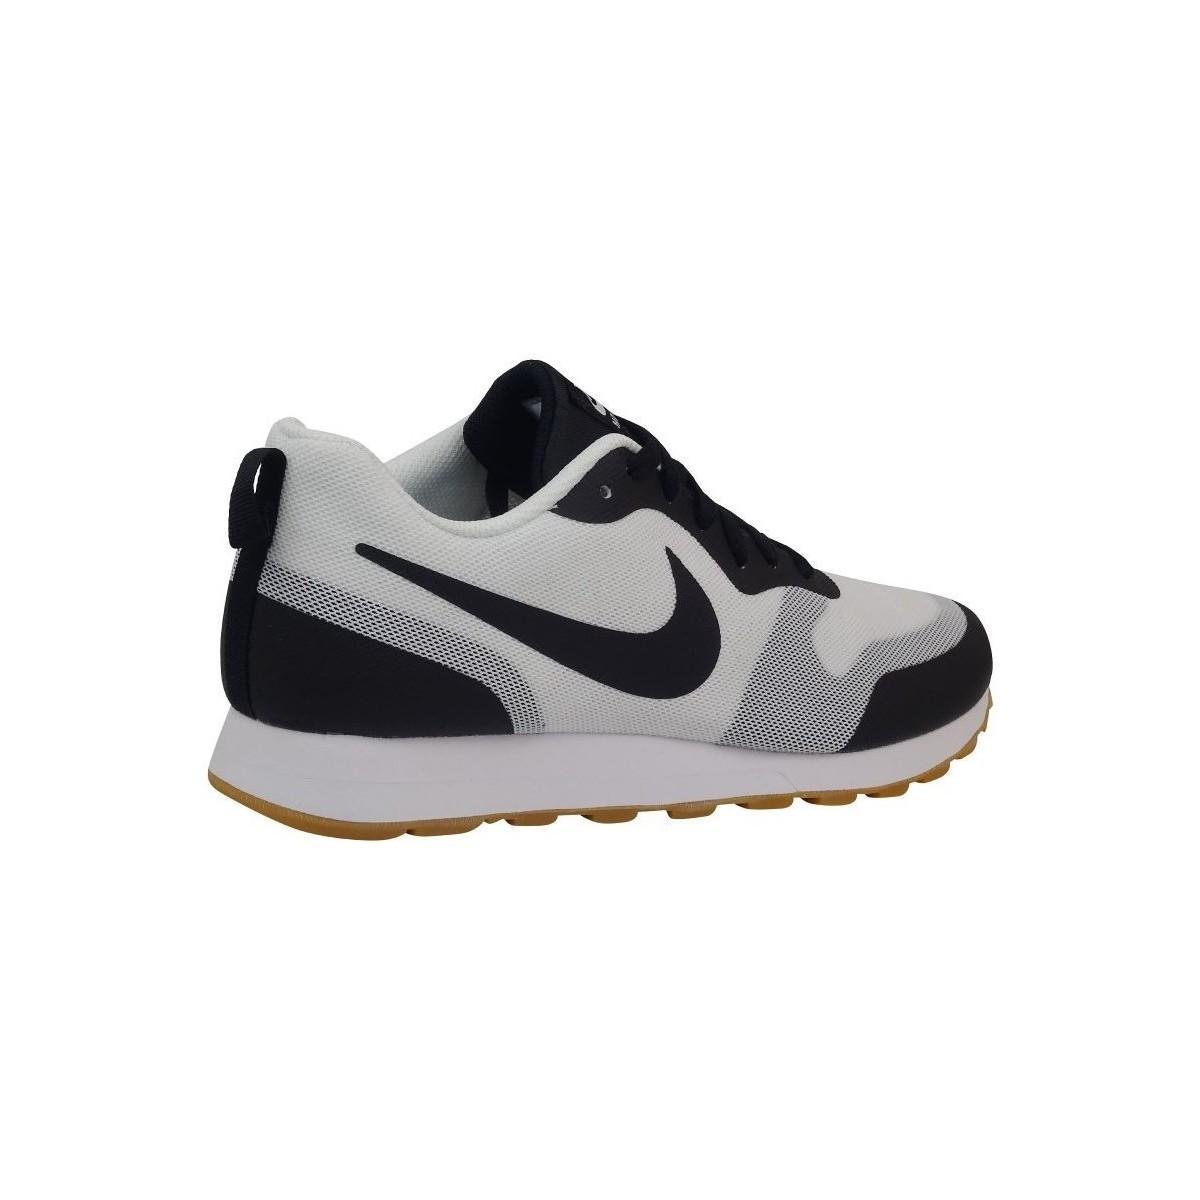 dba1b9b27e5 ... Md Runner 2 19 Men s Shoes (trainers) In Multicolour for Men. View  fullscreen